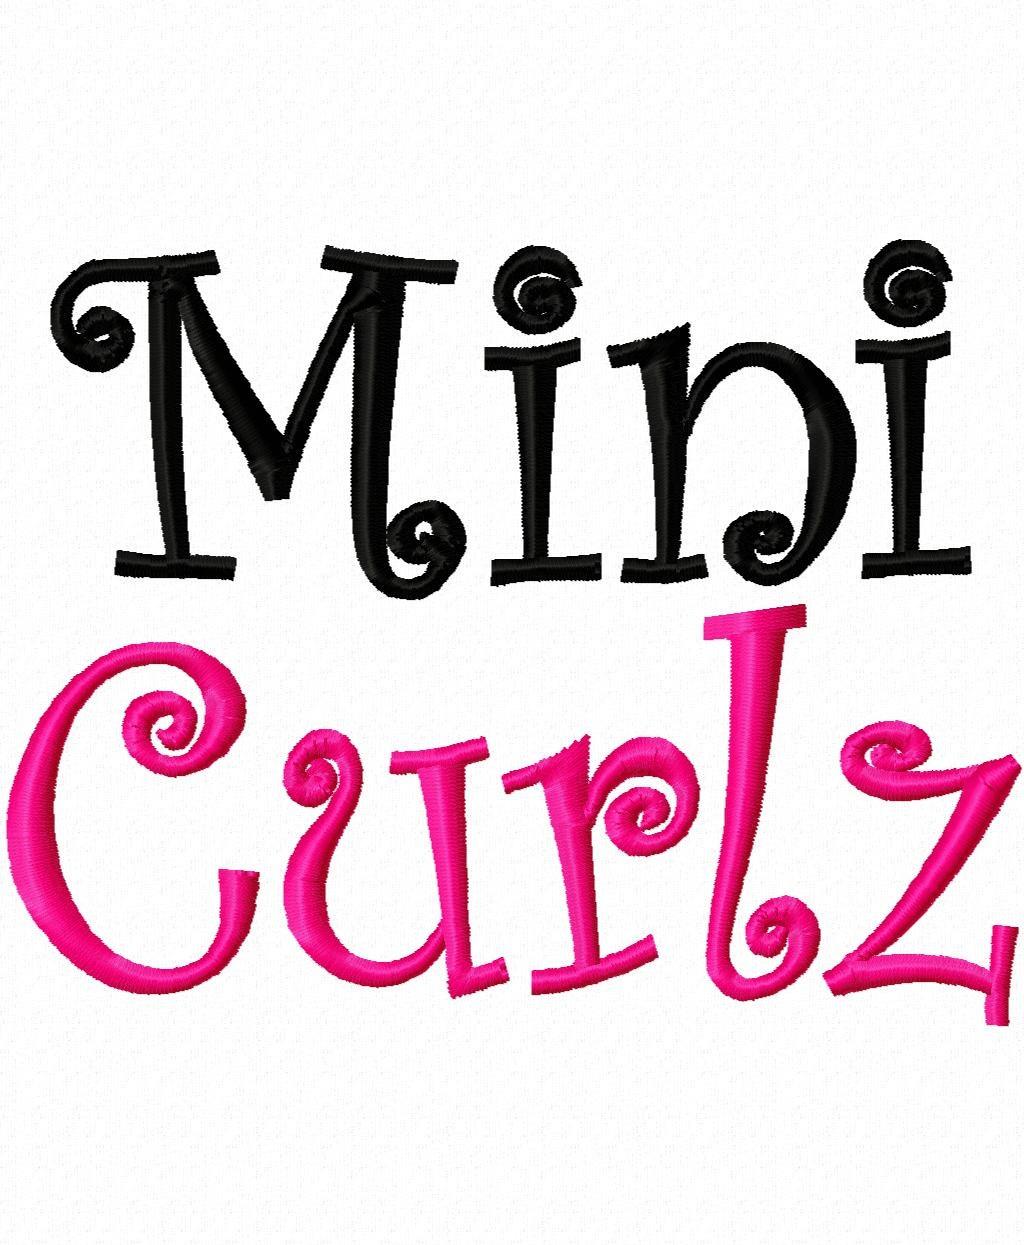 17 Free Curlz Embroidery Monogram Fonts Images Free Curlz